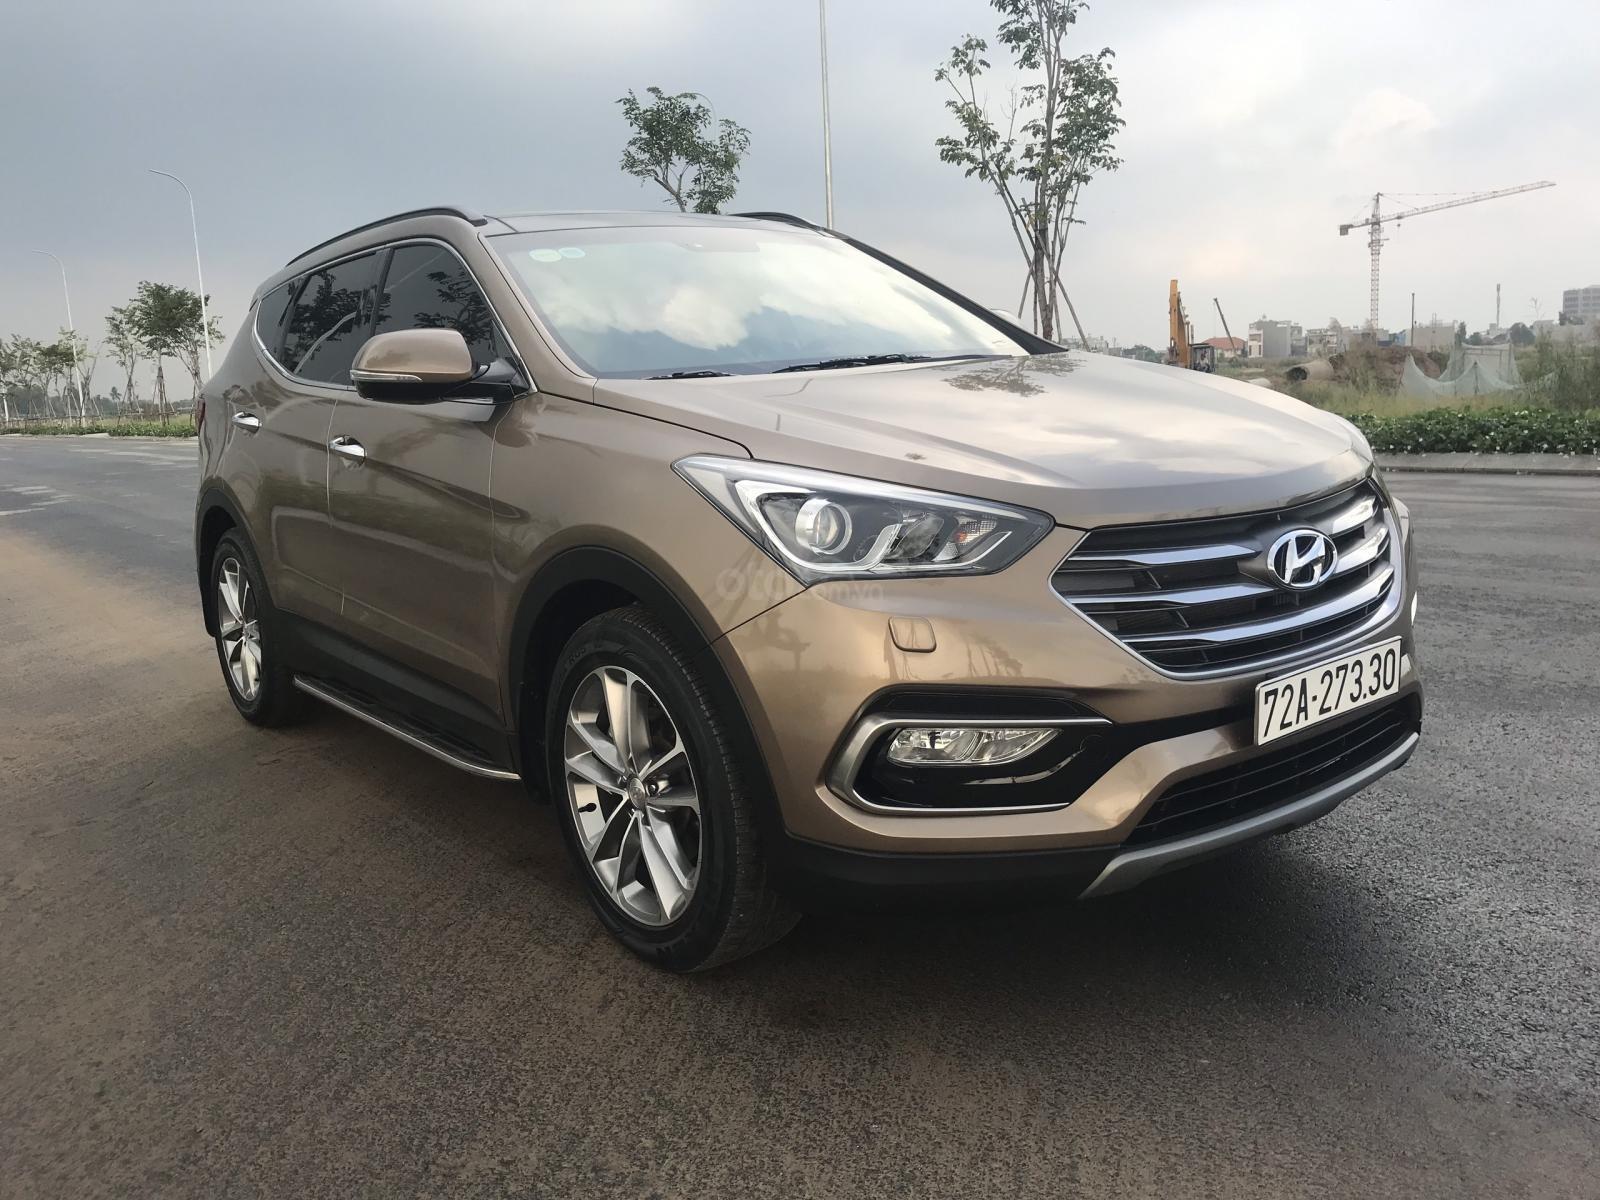 Bán Hyundai Santa Fe 2.2 Full máy dầu sản xuất 2018, odo 19,000km (2)